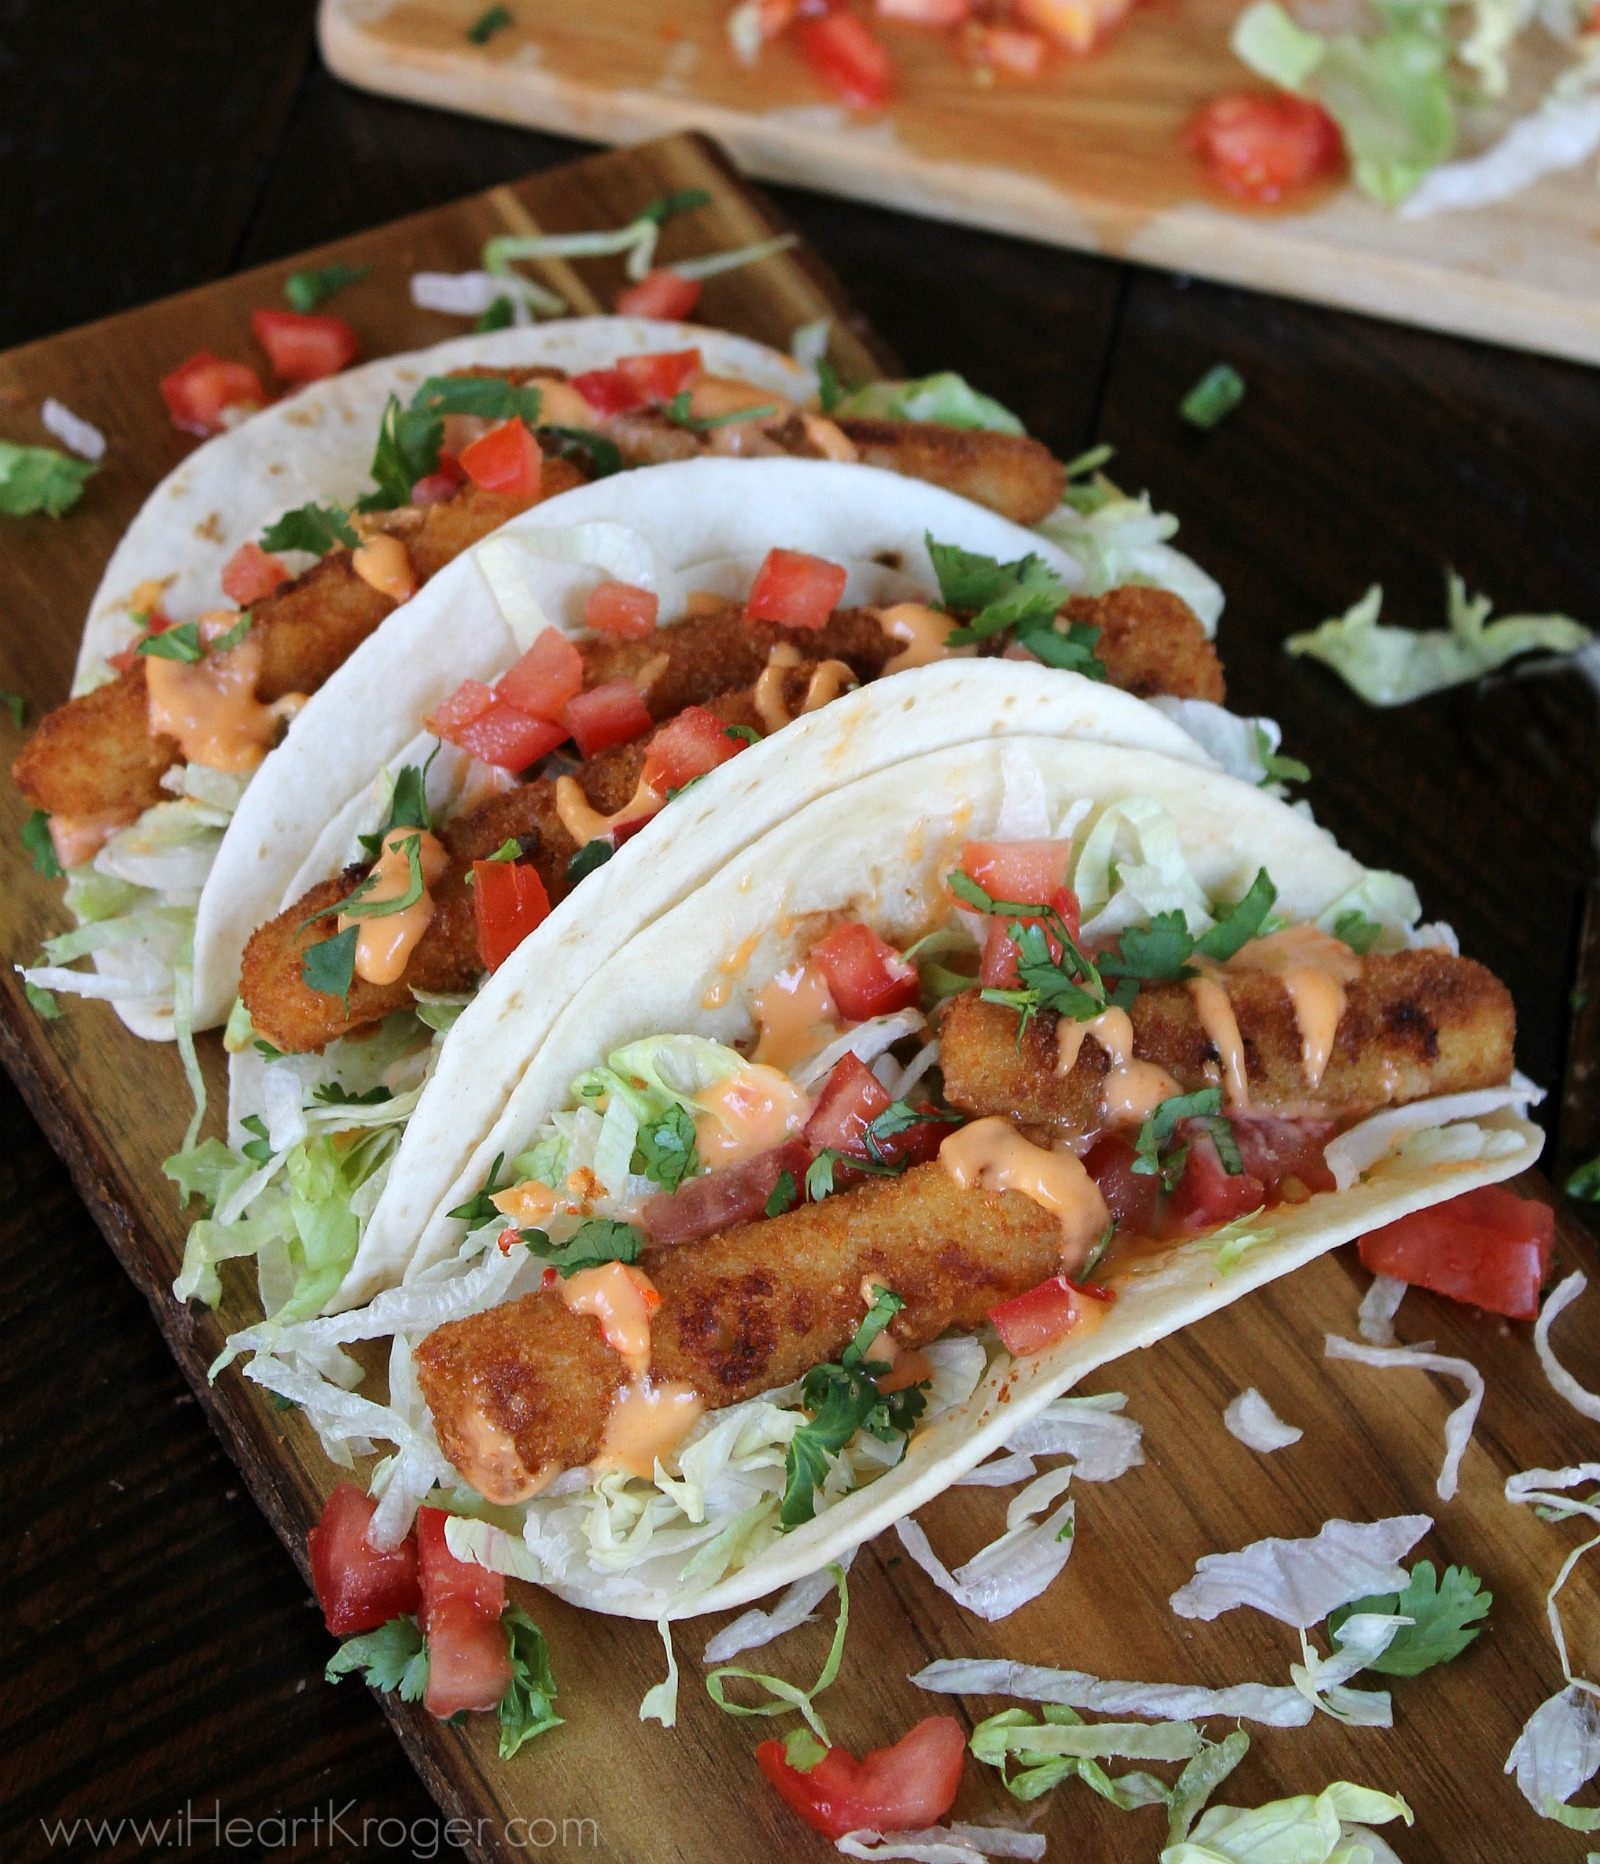 I heart kroger for Easy fish tacos recipe